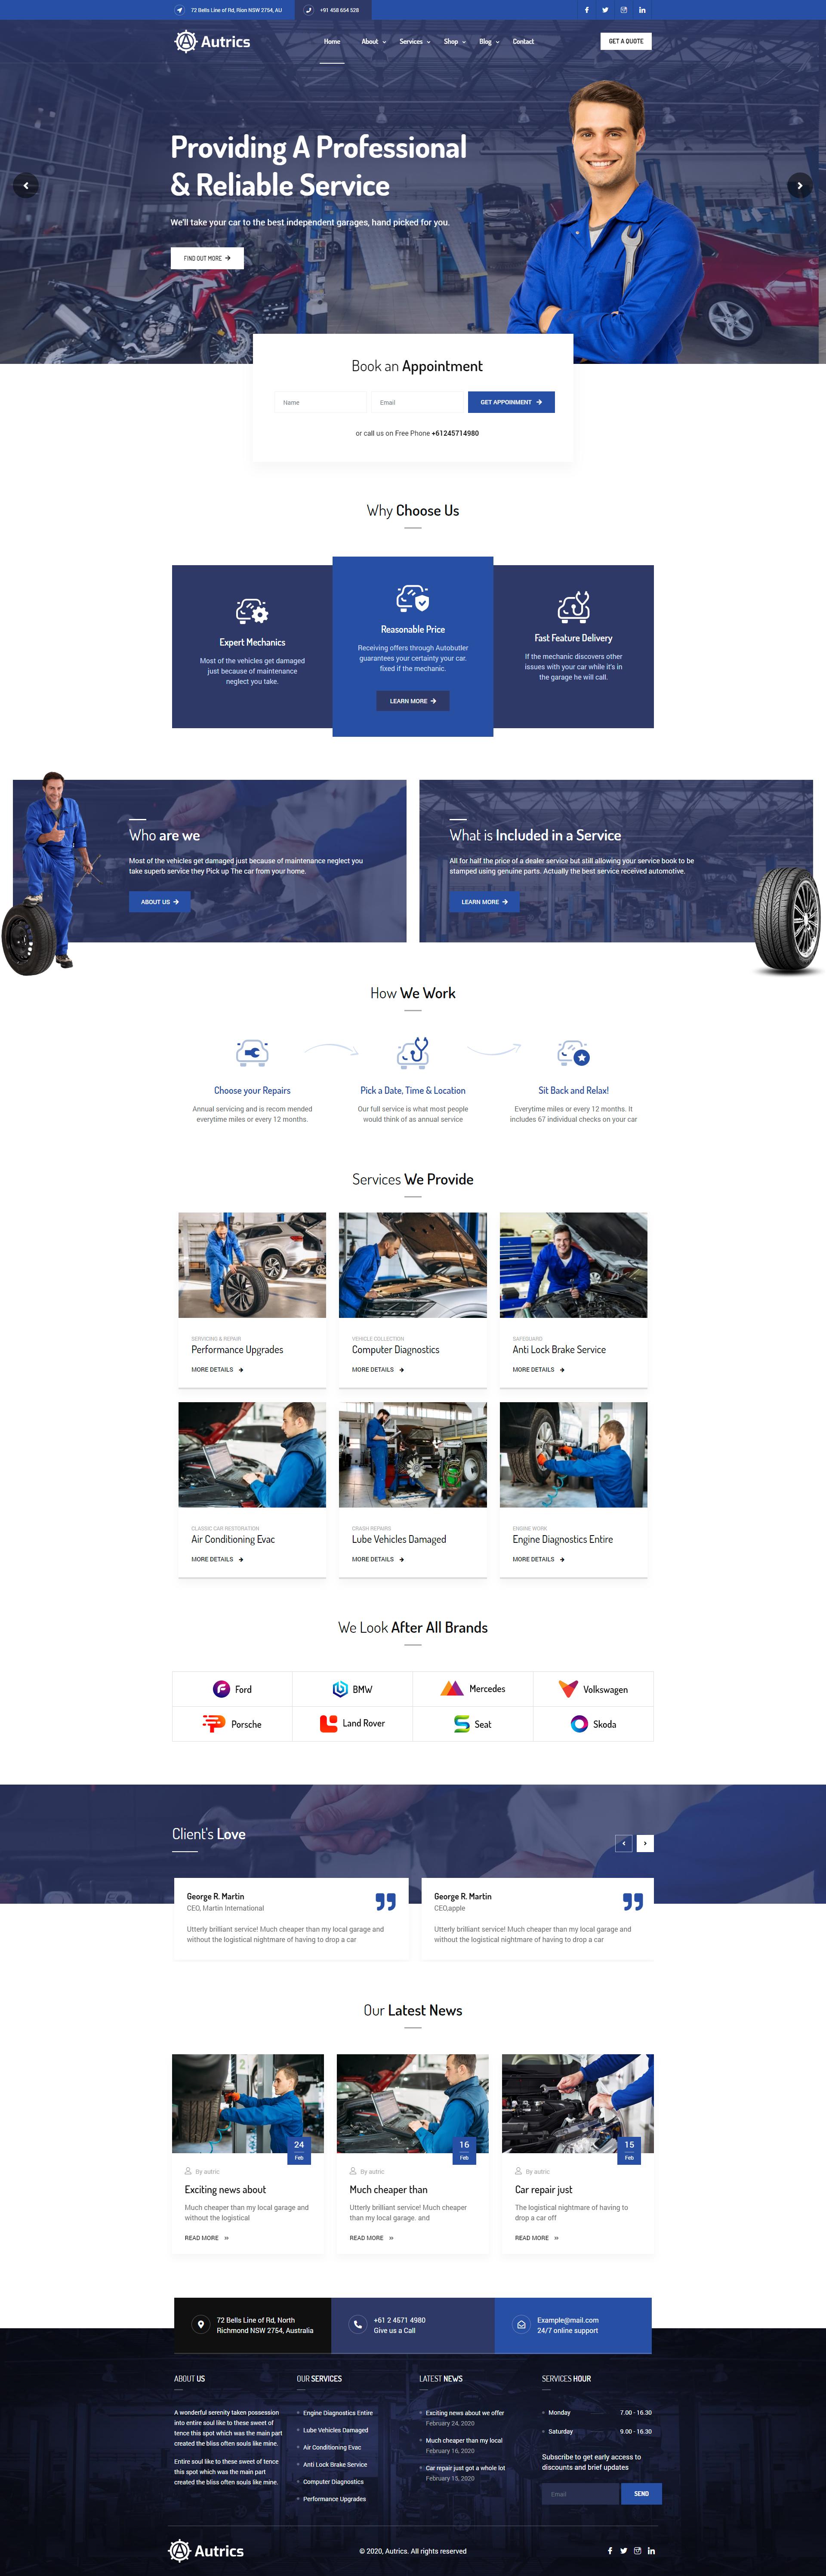 Autrics Car Repair Services And Auto Mechanic Wordpress Theme Stylelib Web Design Web Design Logo Web Development Design